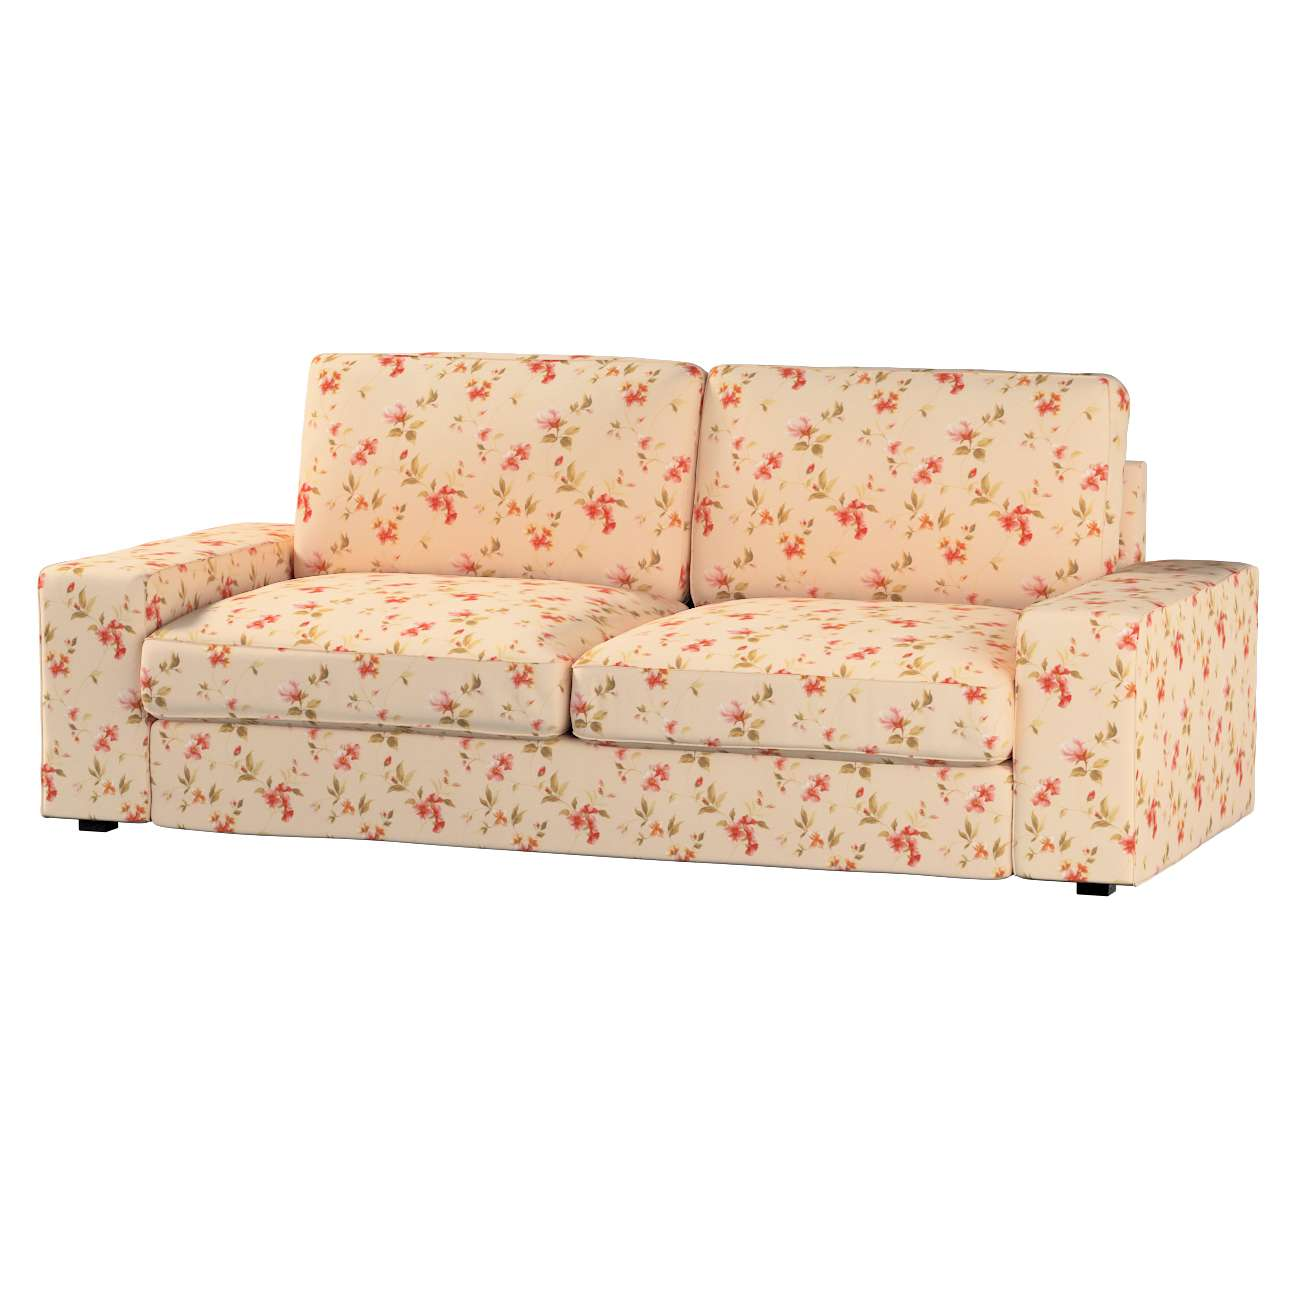 Kivik 3-Sitzer Sofabezug Sofa Kivik 3-Sitzer von der Kollektion Londres, Stoff: 124-05